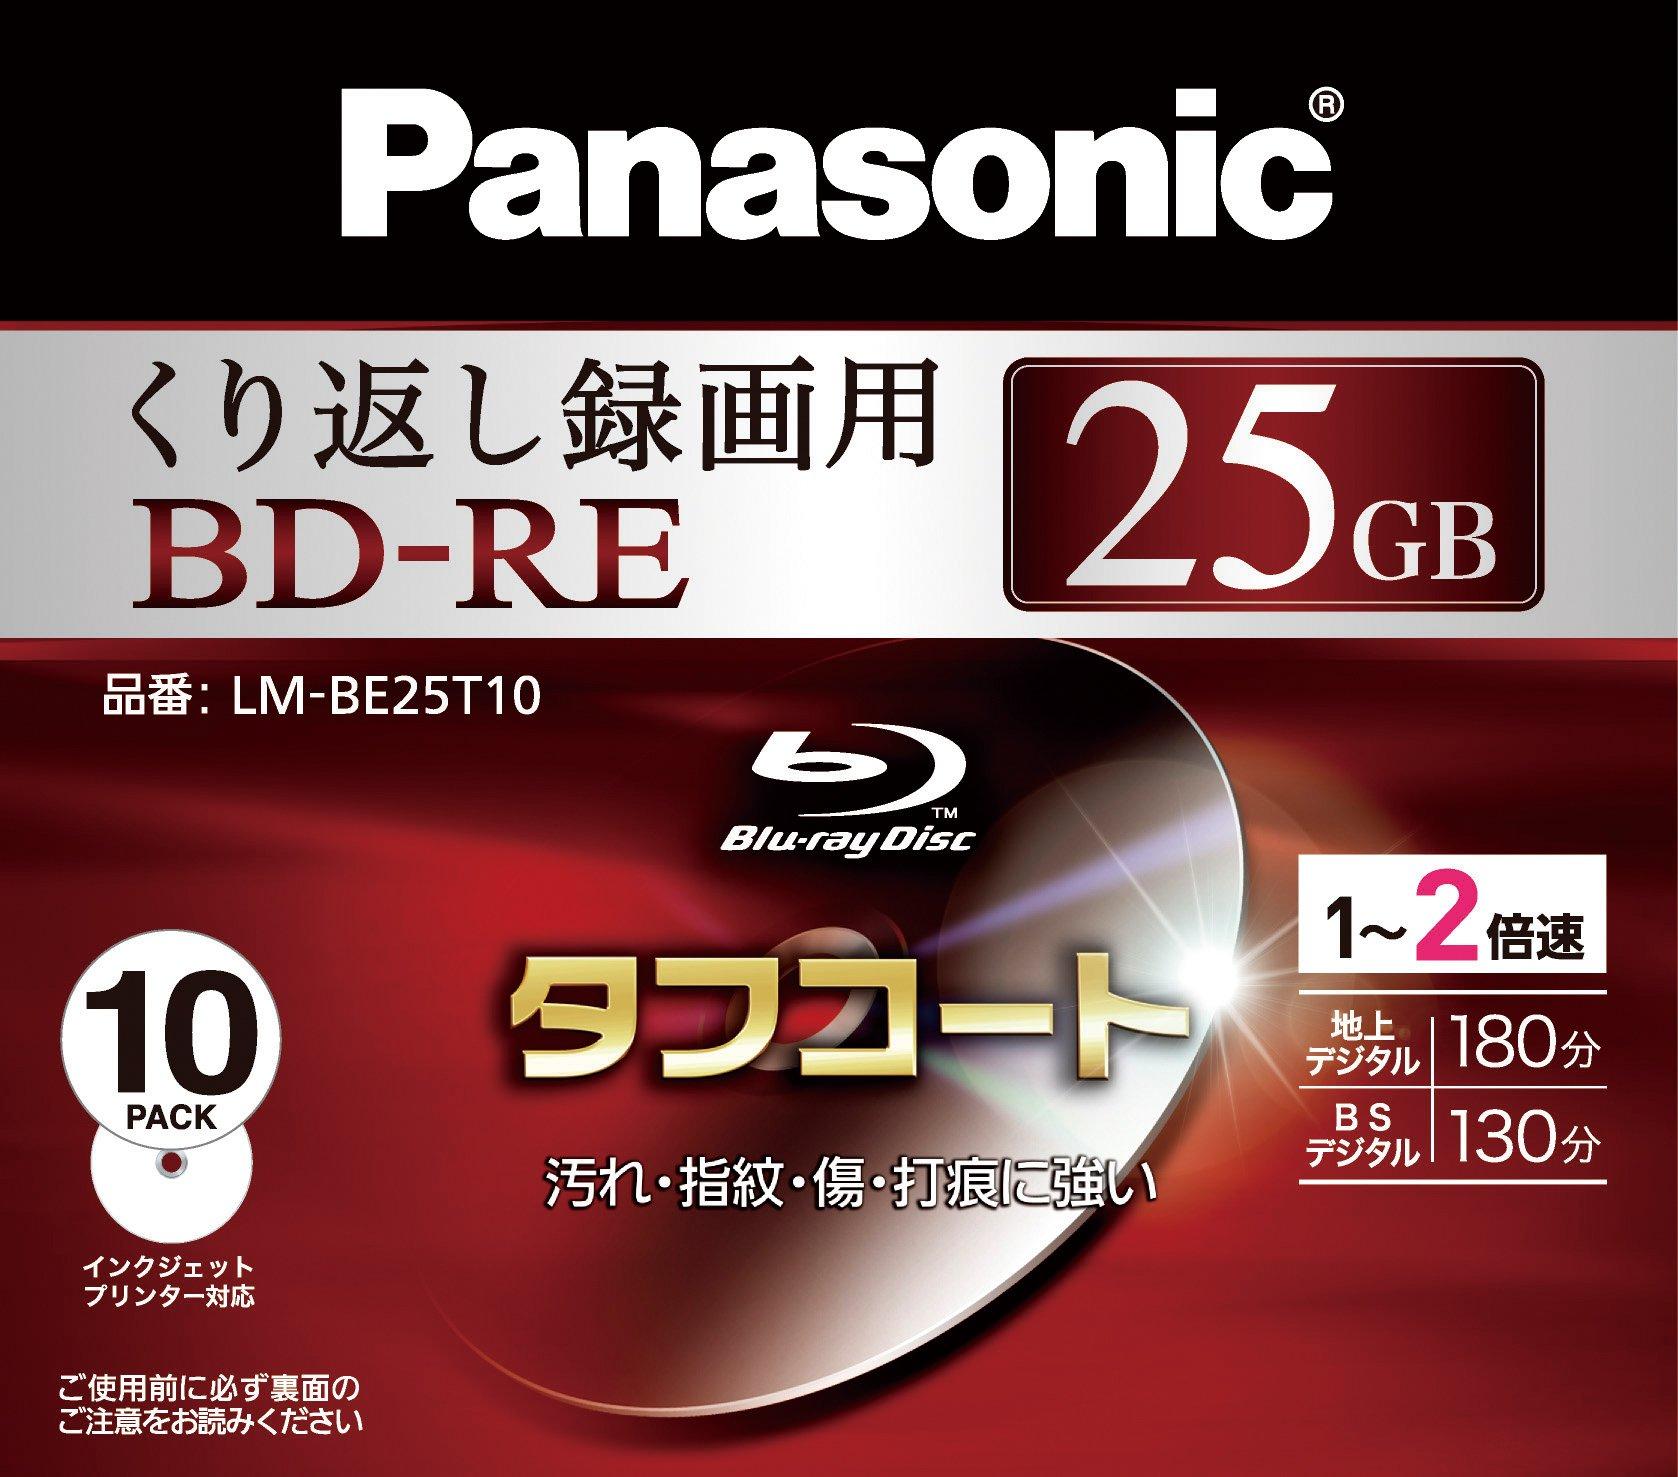 PANASONIC Blu-ray BD-RE Rewritable Disk   25GB 2x Speed   10 Pack Ink-jet Printable (Japan Import)